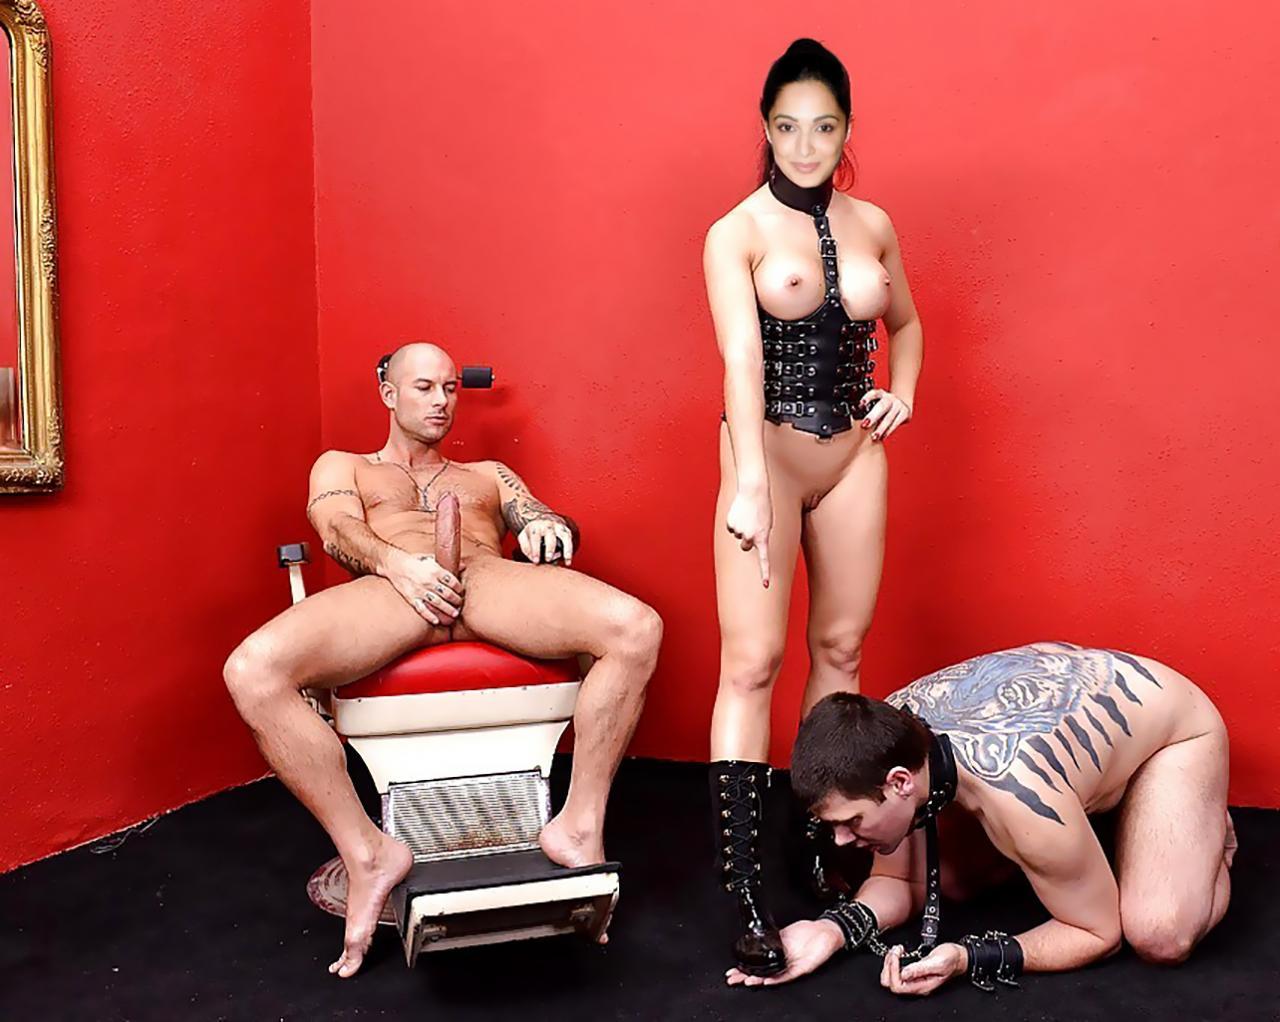 Kiara Advani Sexy Porn Star Posing Nude